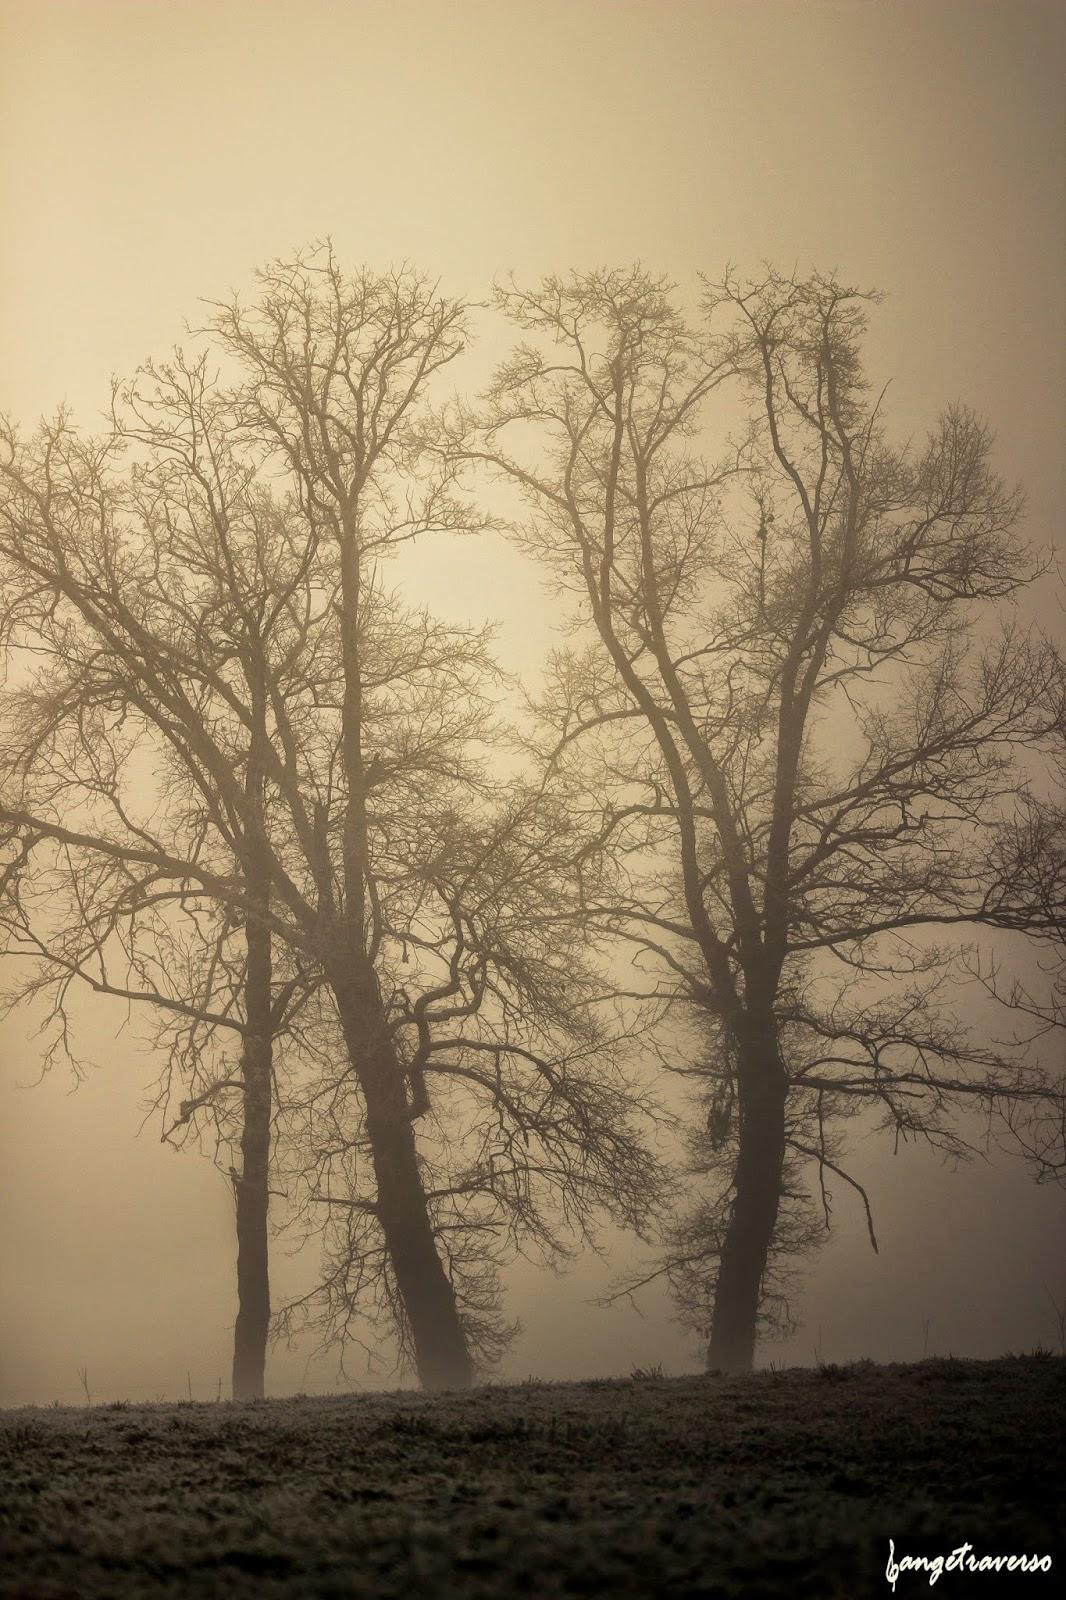 Trees in myst, in Haute-Savoie